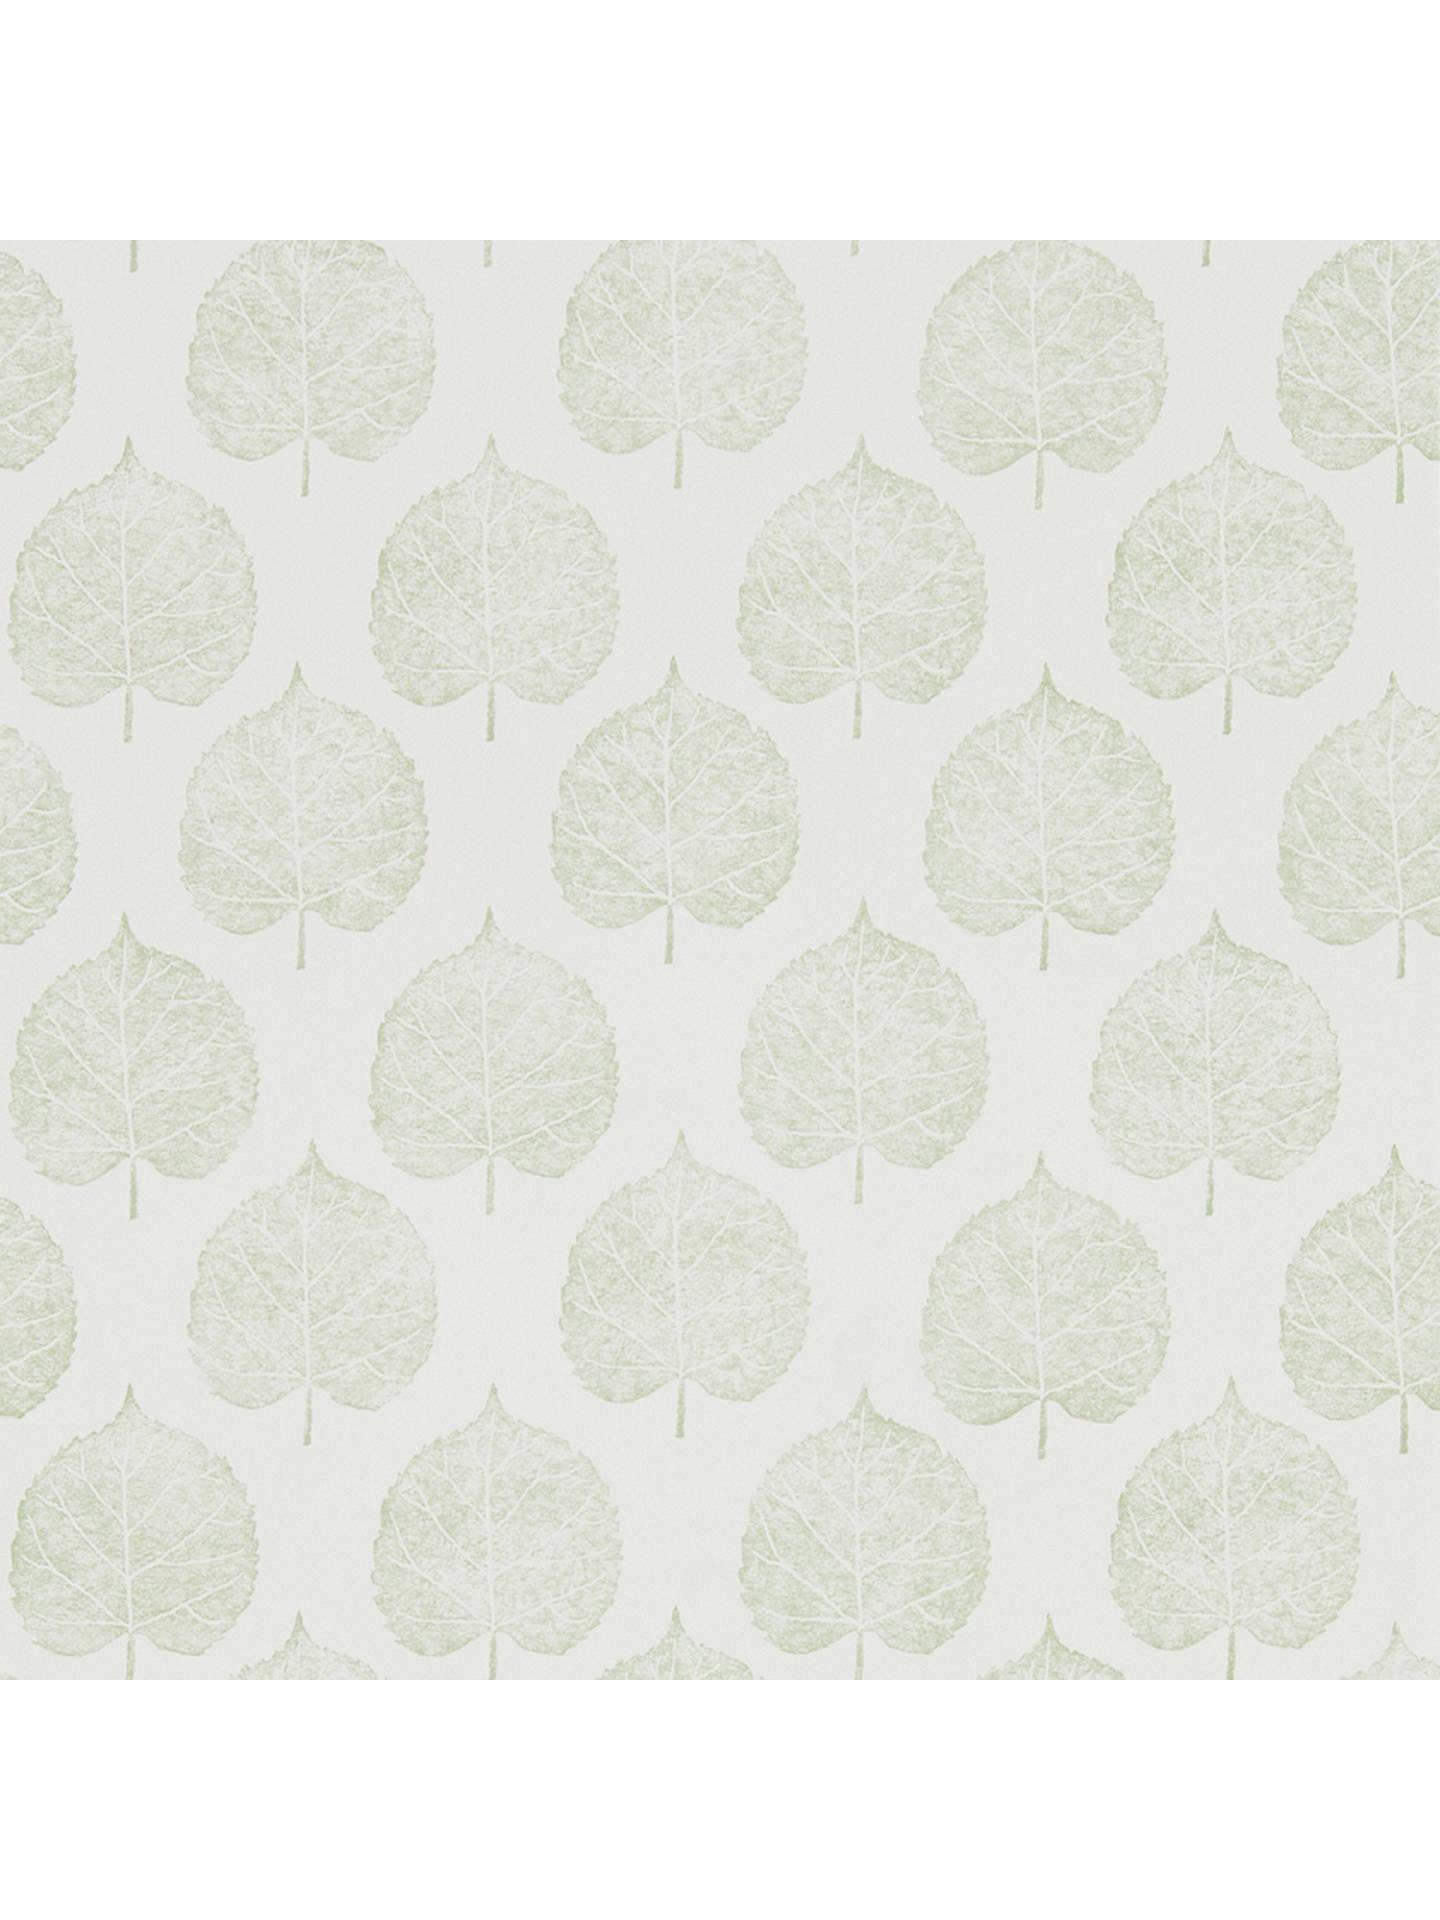 eab673cfdf7bb Buy Sanderson Home Lyme Leaf Wallpaper DHPO216383 Online at johnlewis.com